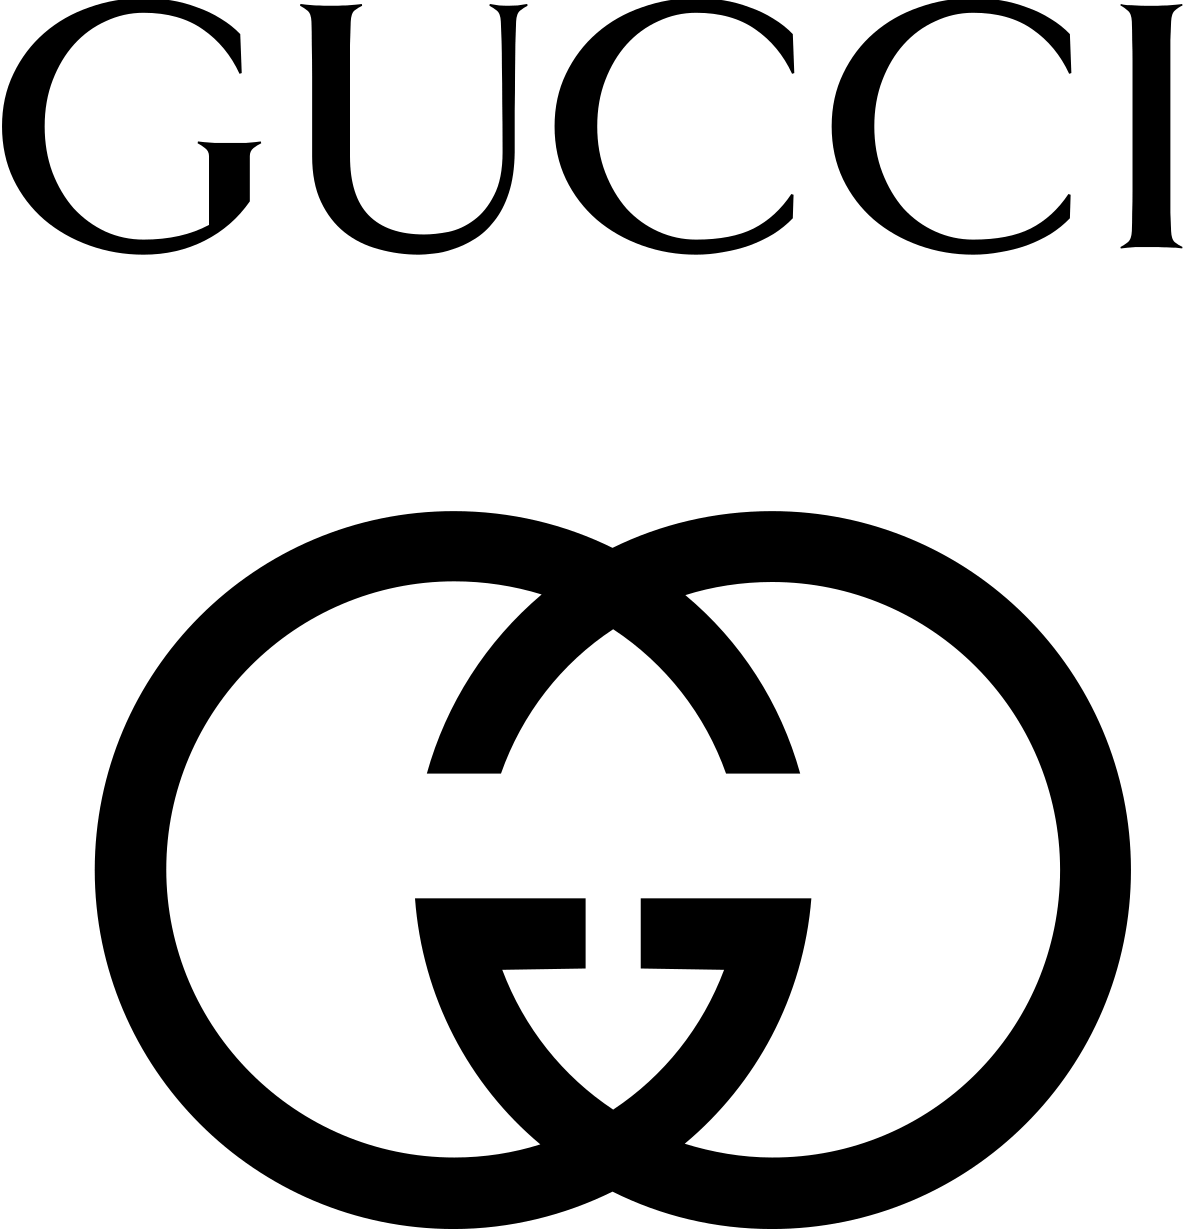 Gucci monogram logo